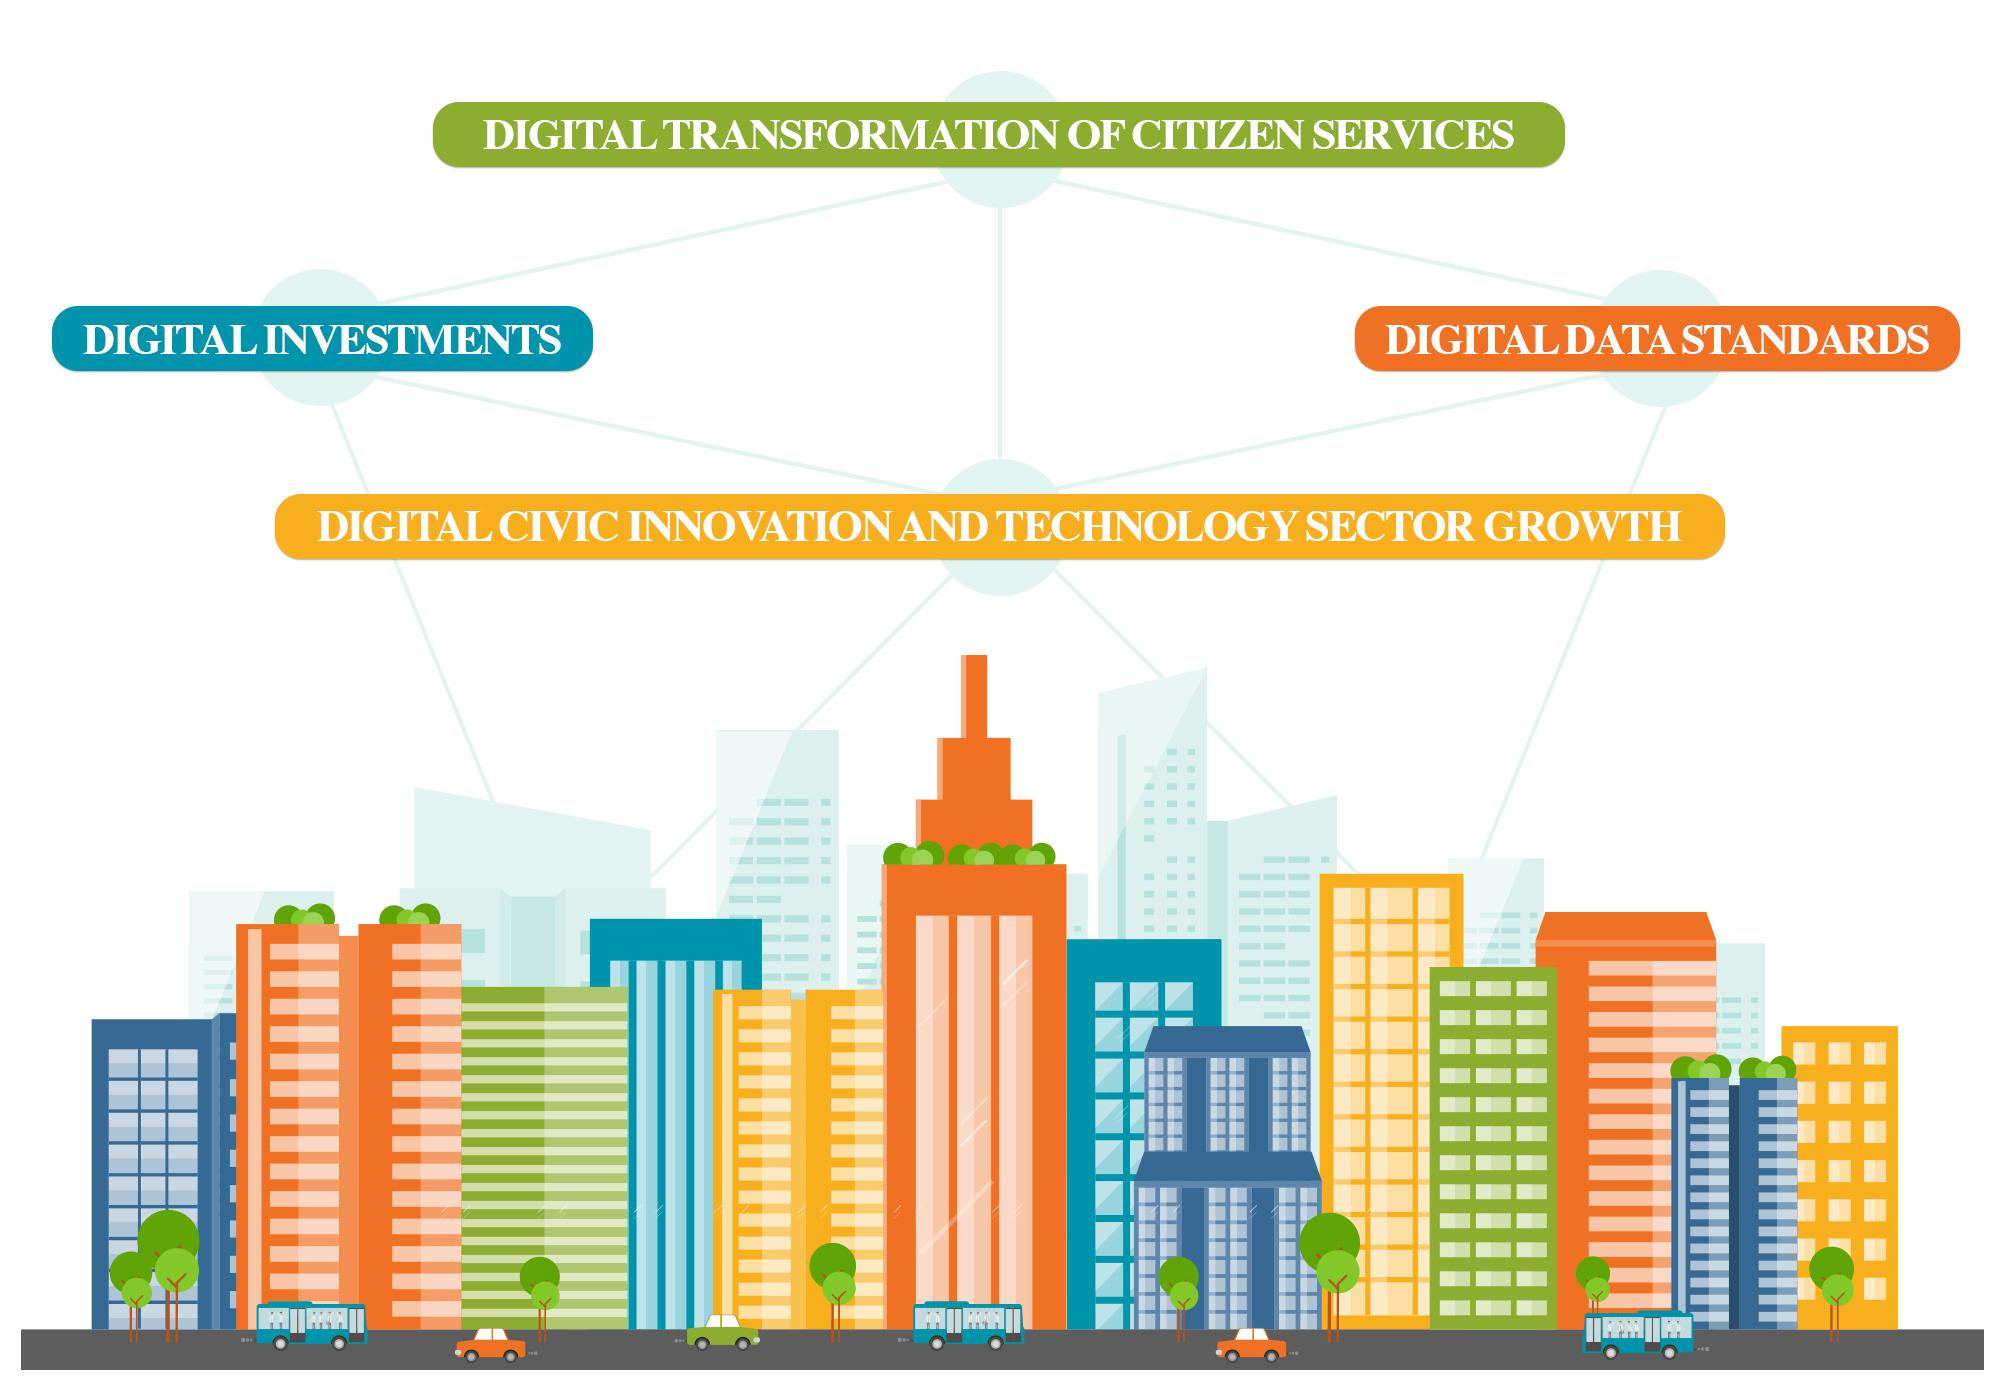 Smart City - Doral